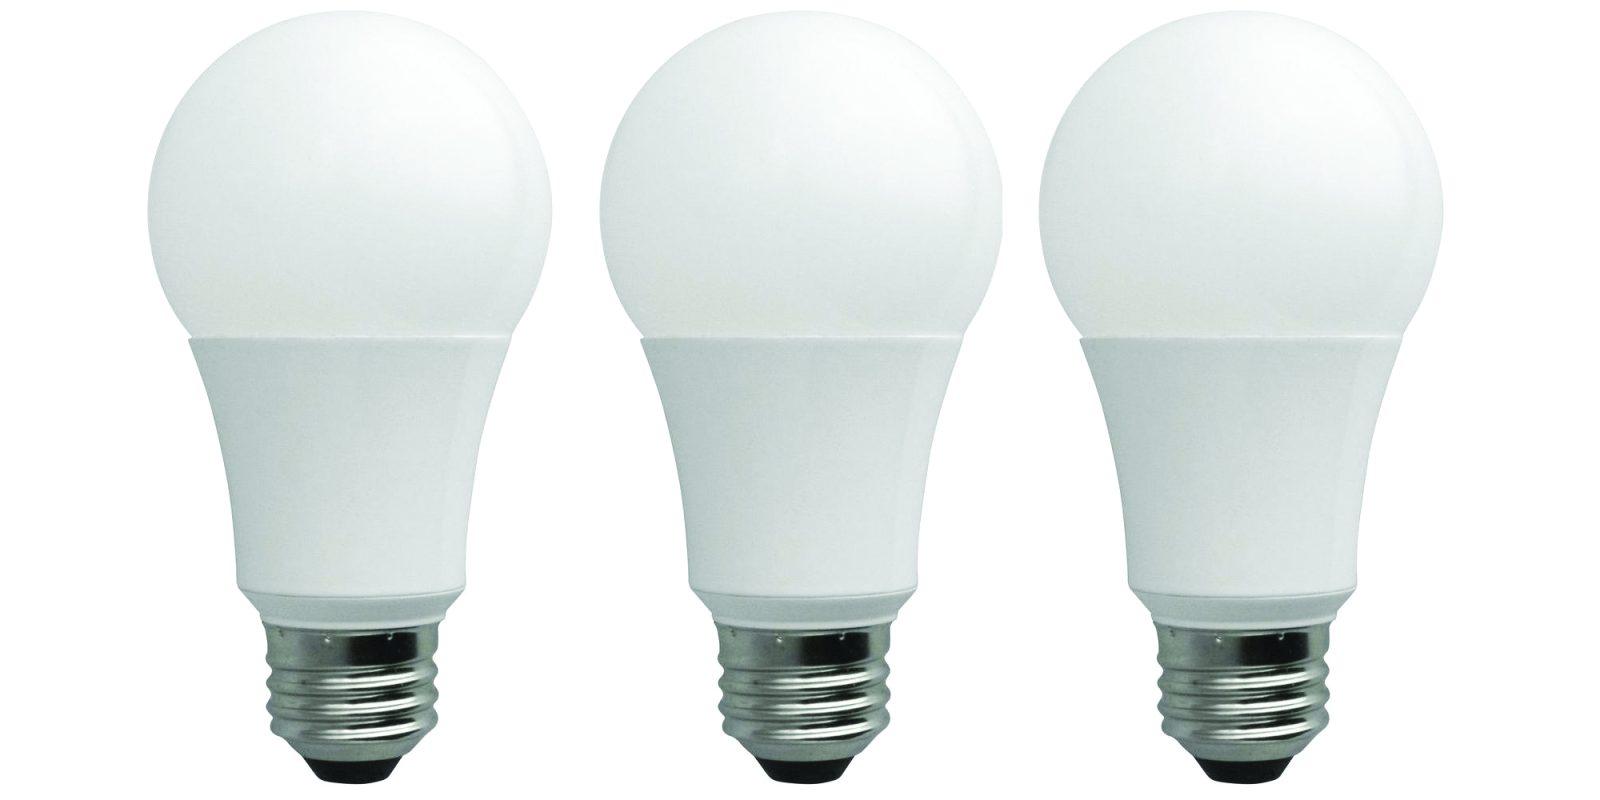 Green Deals: TCP 60W LED Light Bulbs from $1/ea., more - Electrek